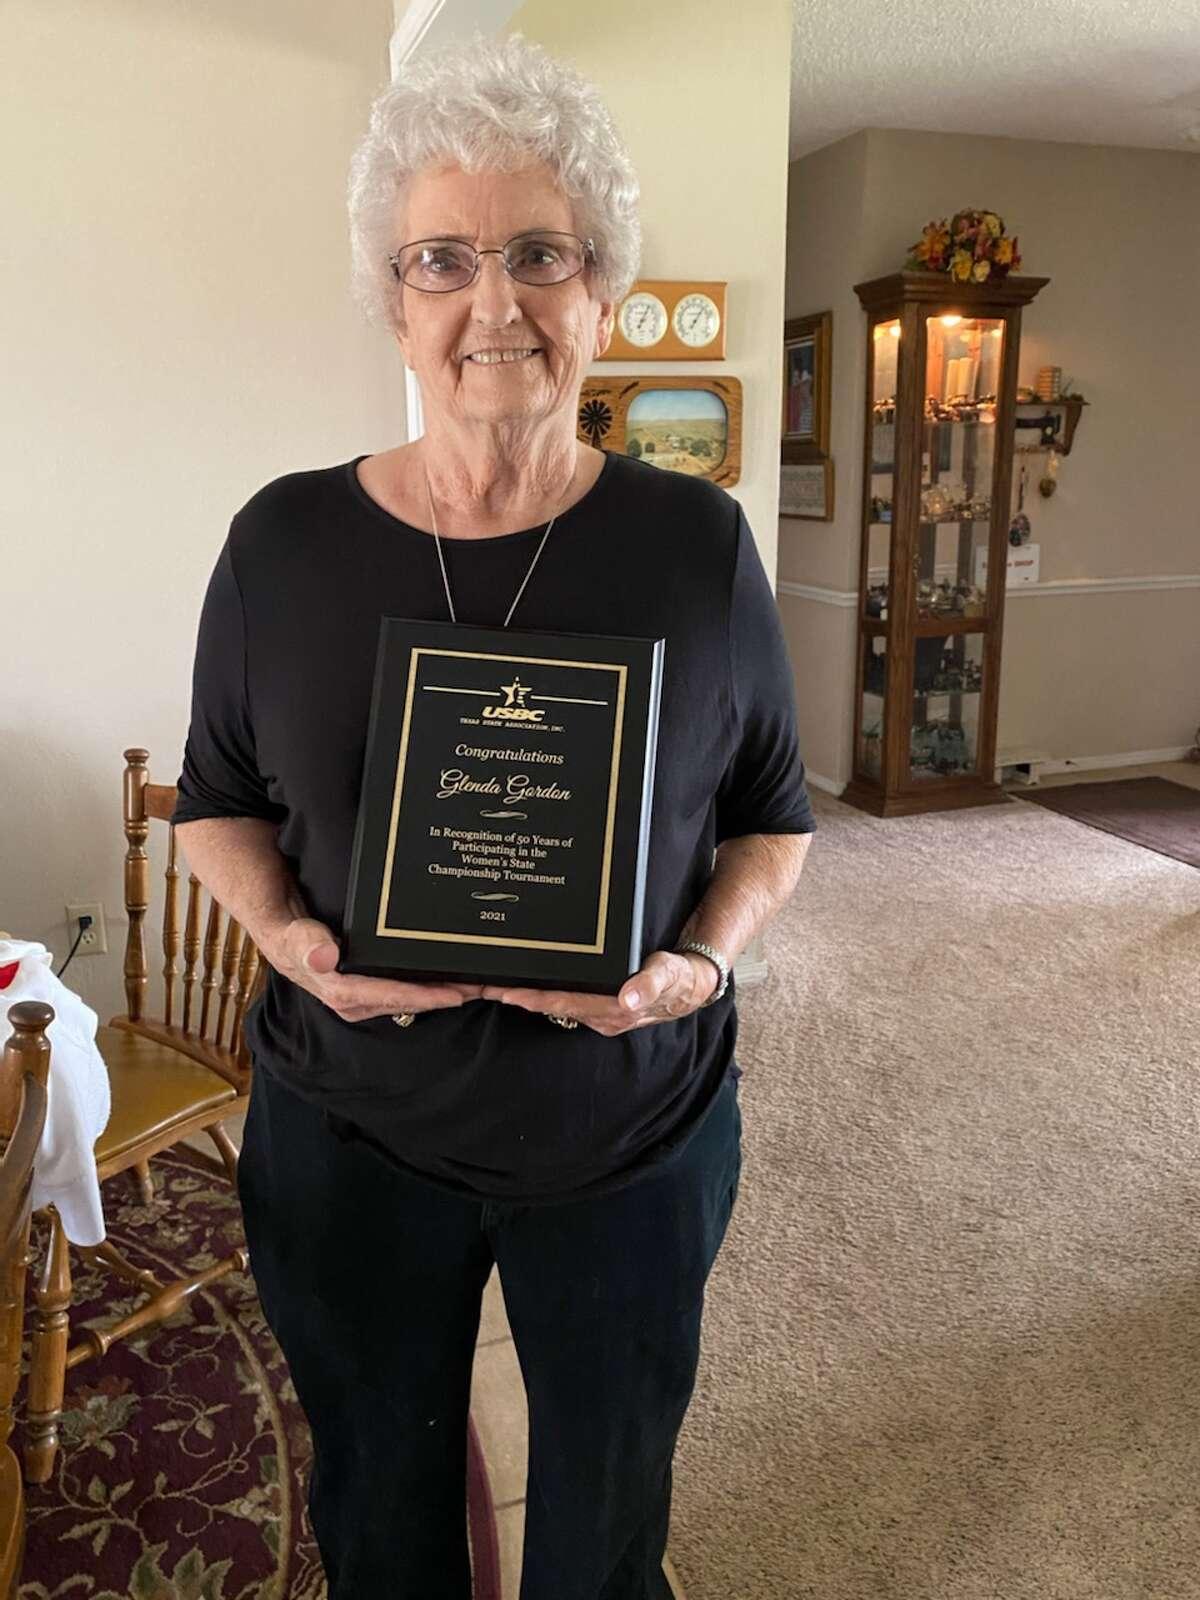 Former longtime Plainview resident Glenda Gordon holds her plaque commemorating 50 Texas Women's Bowling Association state tournaments.